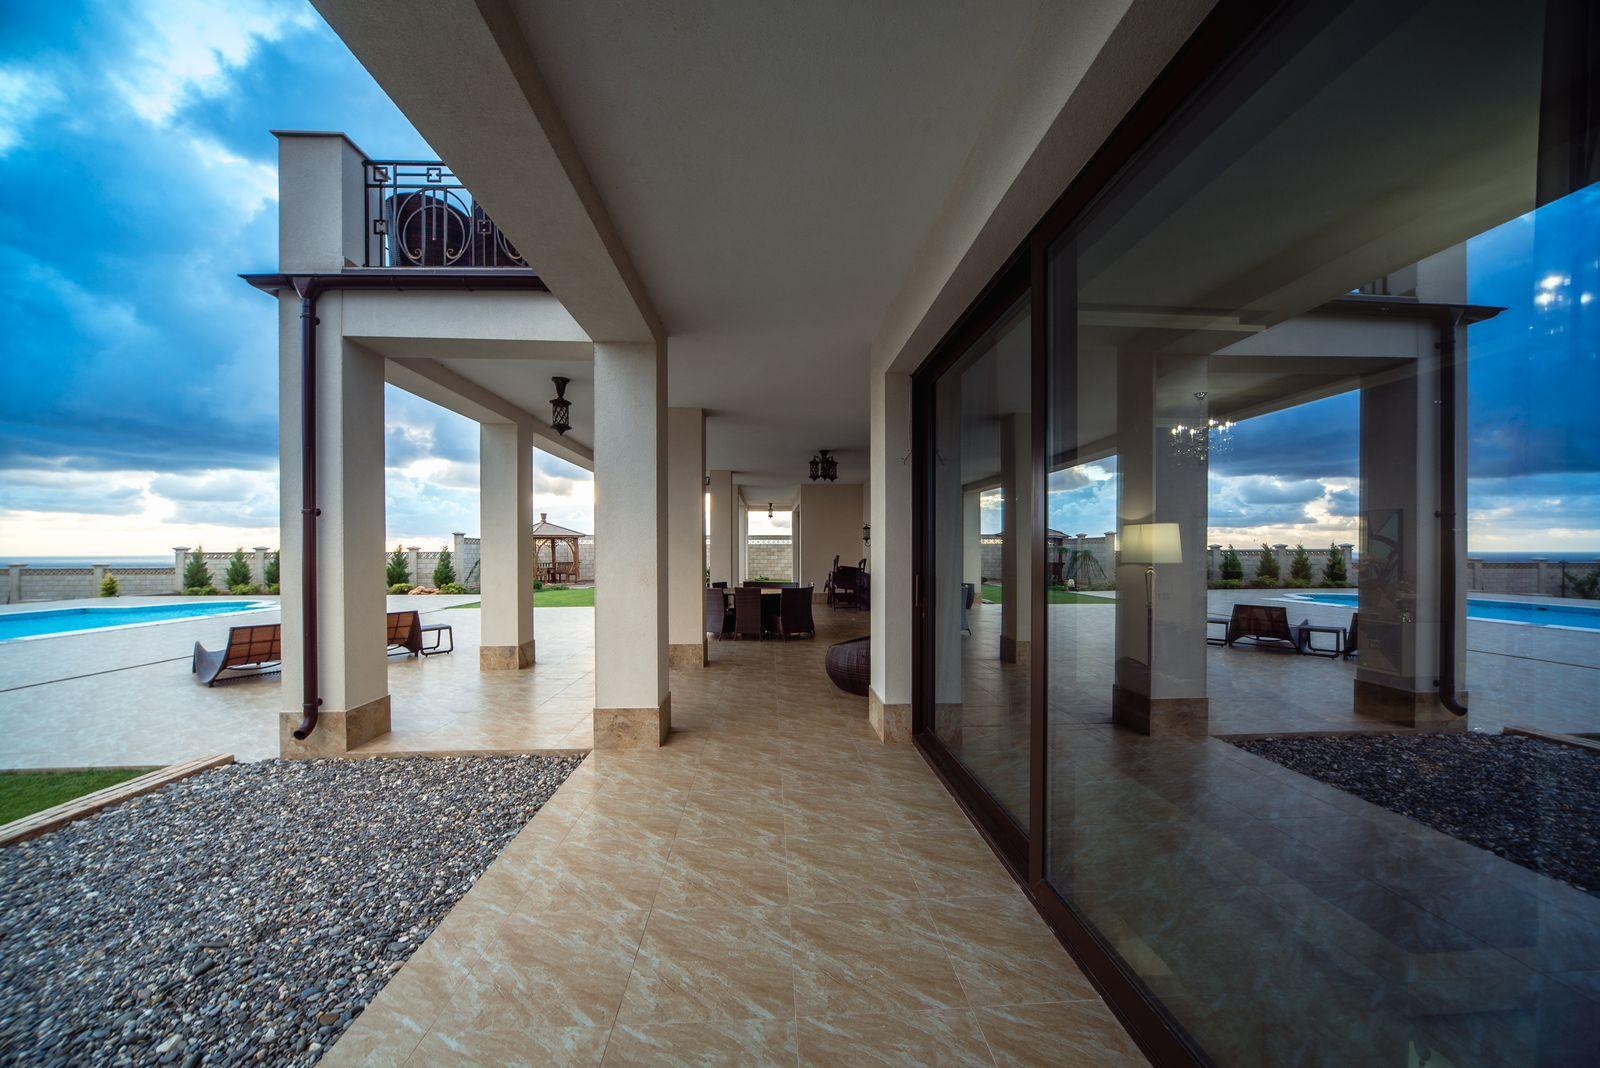 200 m2 de terraza